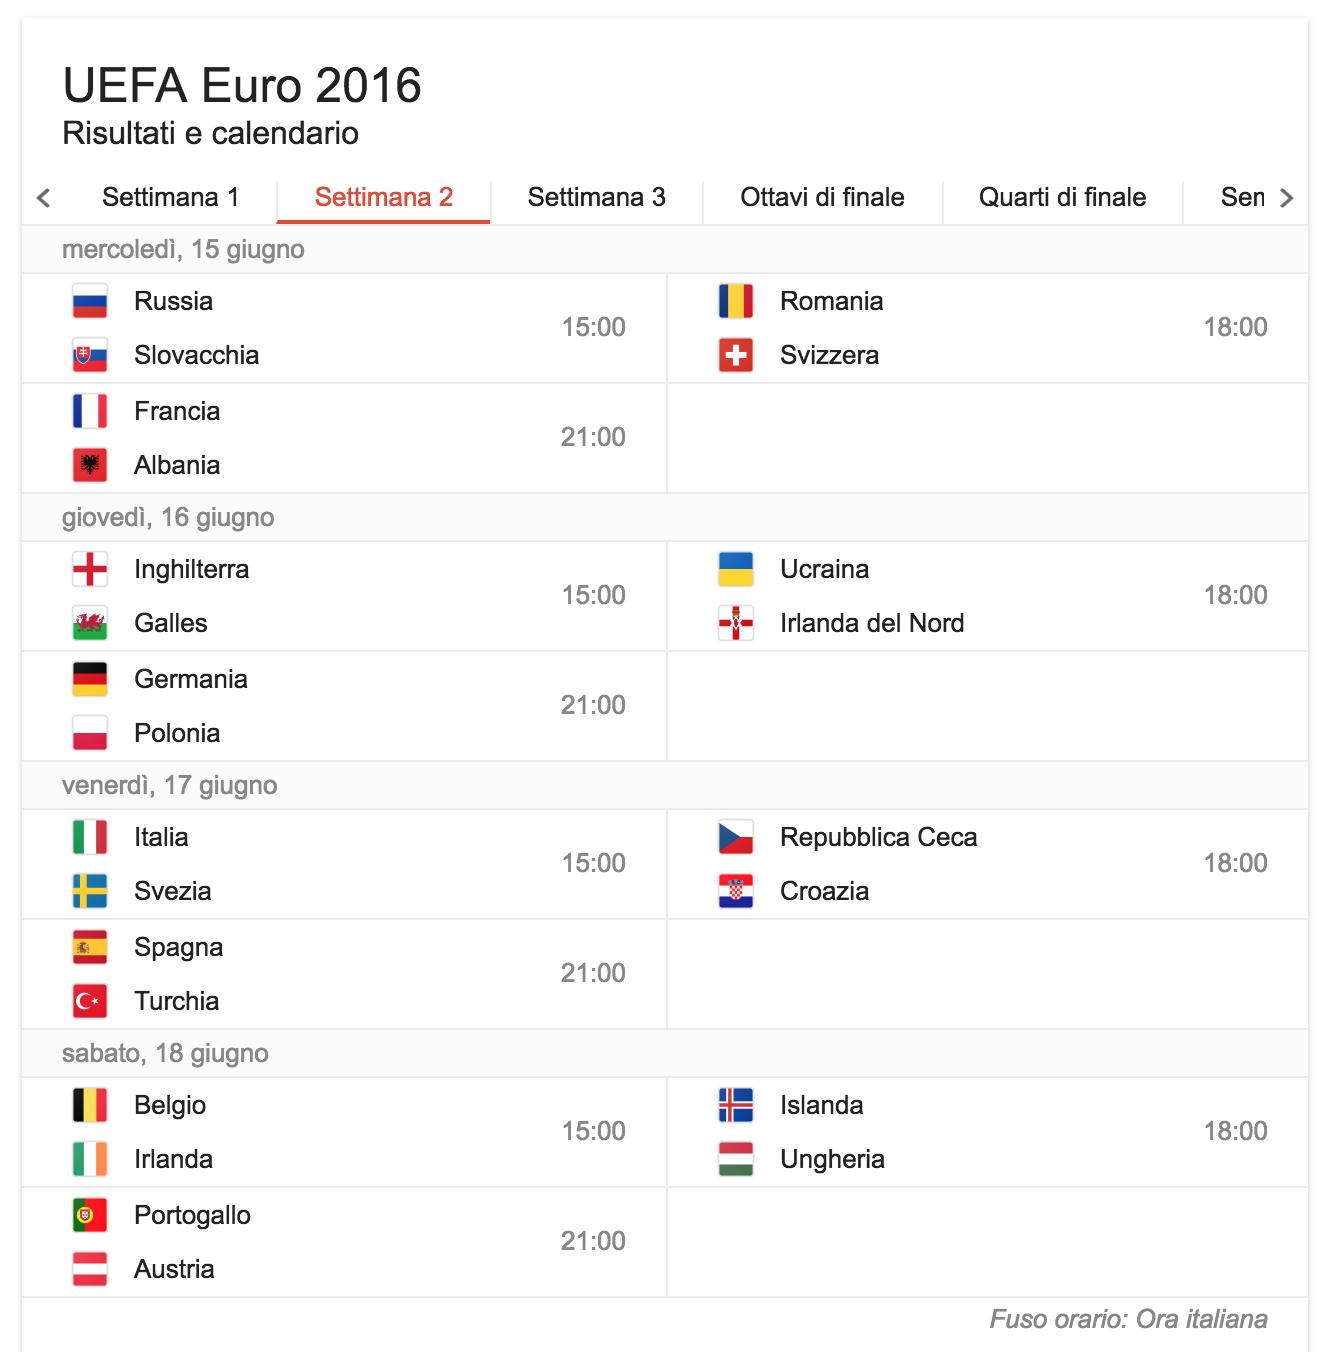 settimana 2 calendario partite europei di calcio 2016